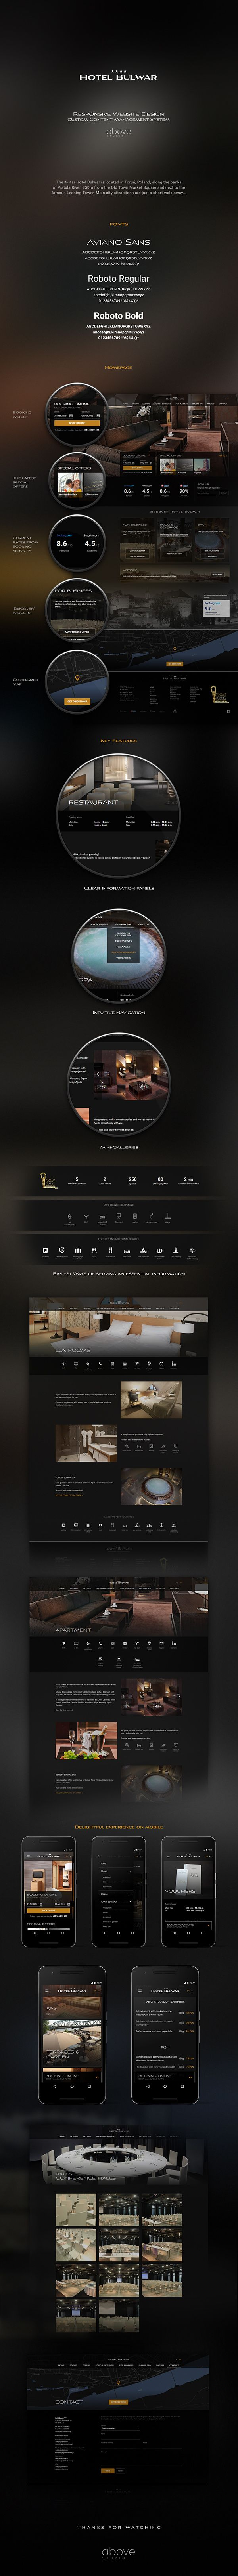 Hotel Bulwar**** - responsive website design. Check it out on my behance portfolio https://www.behance.net/gallery/36389323/Hotel-Bulwar-responsive-website-design